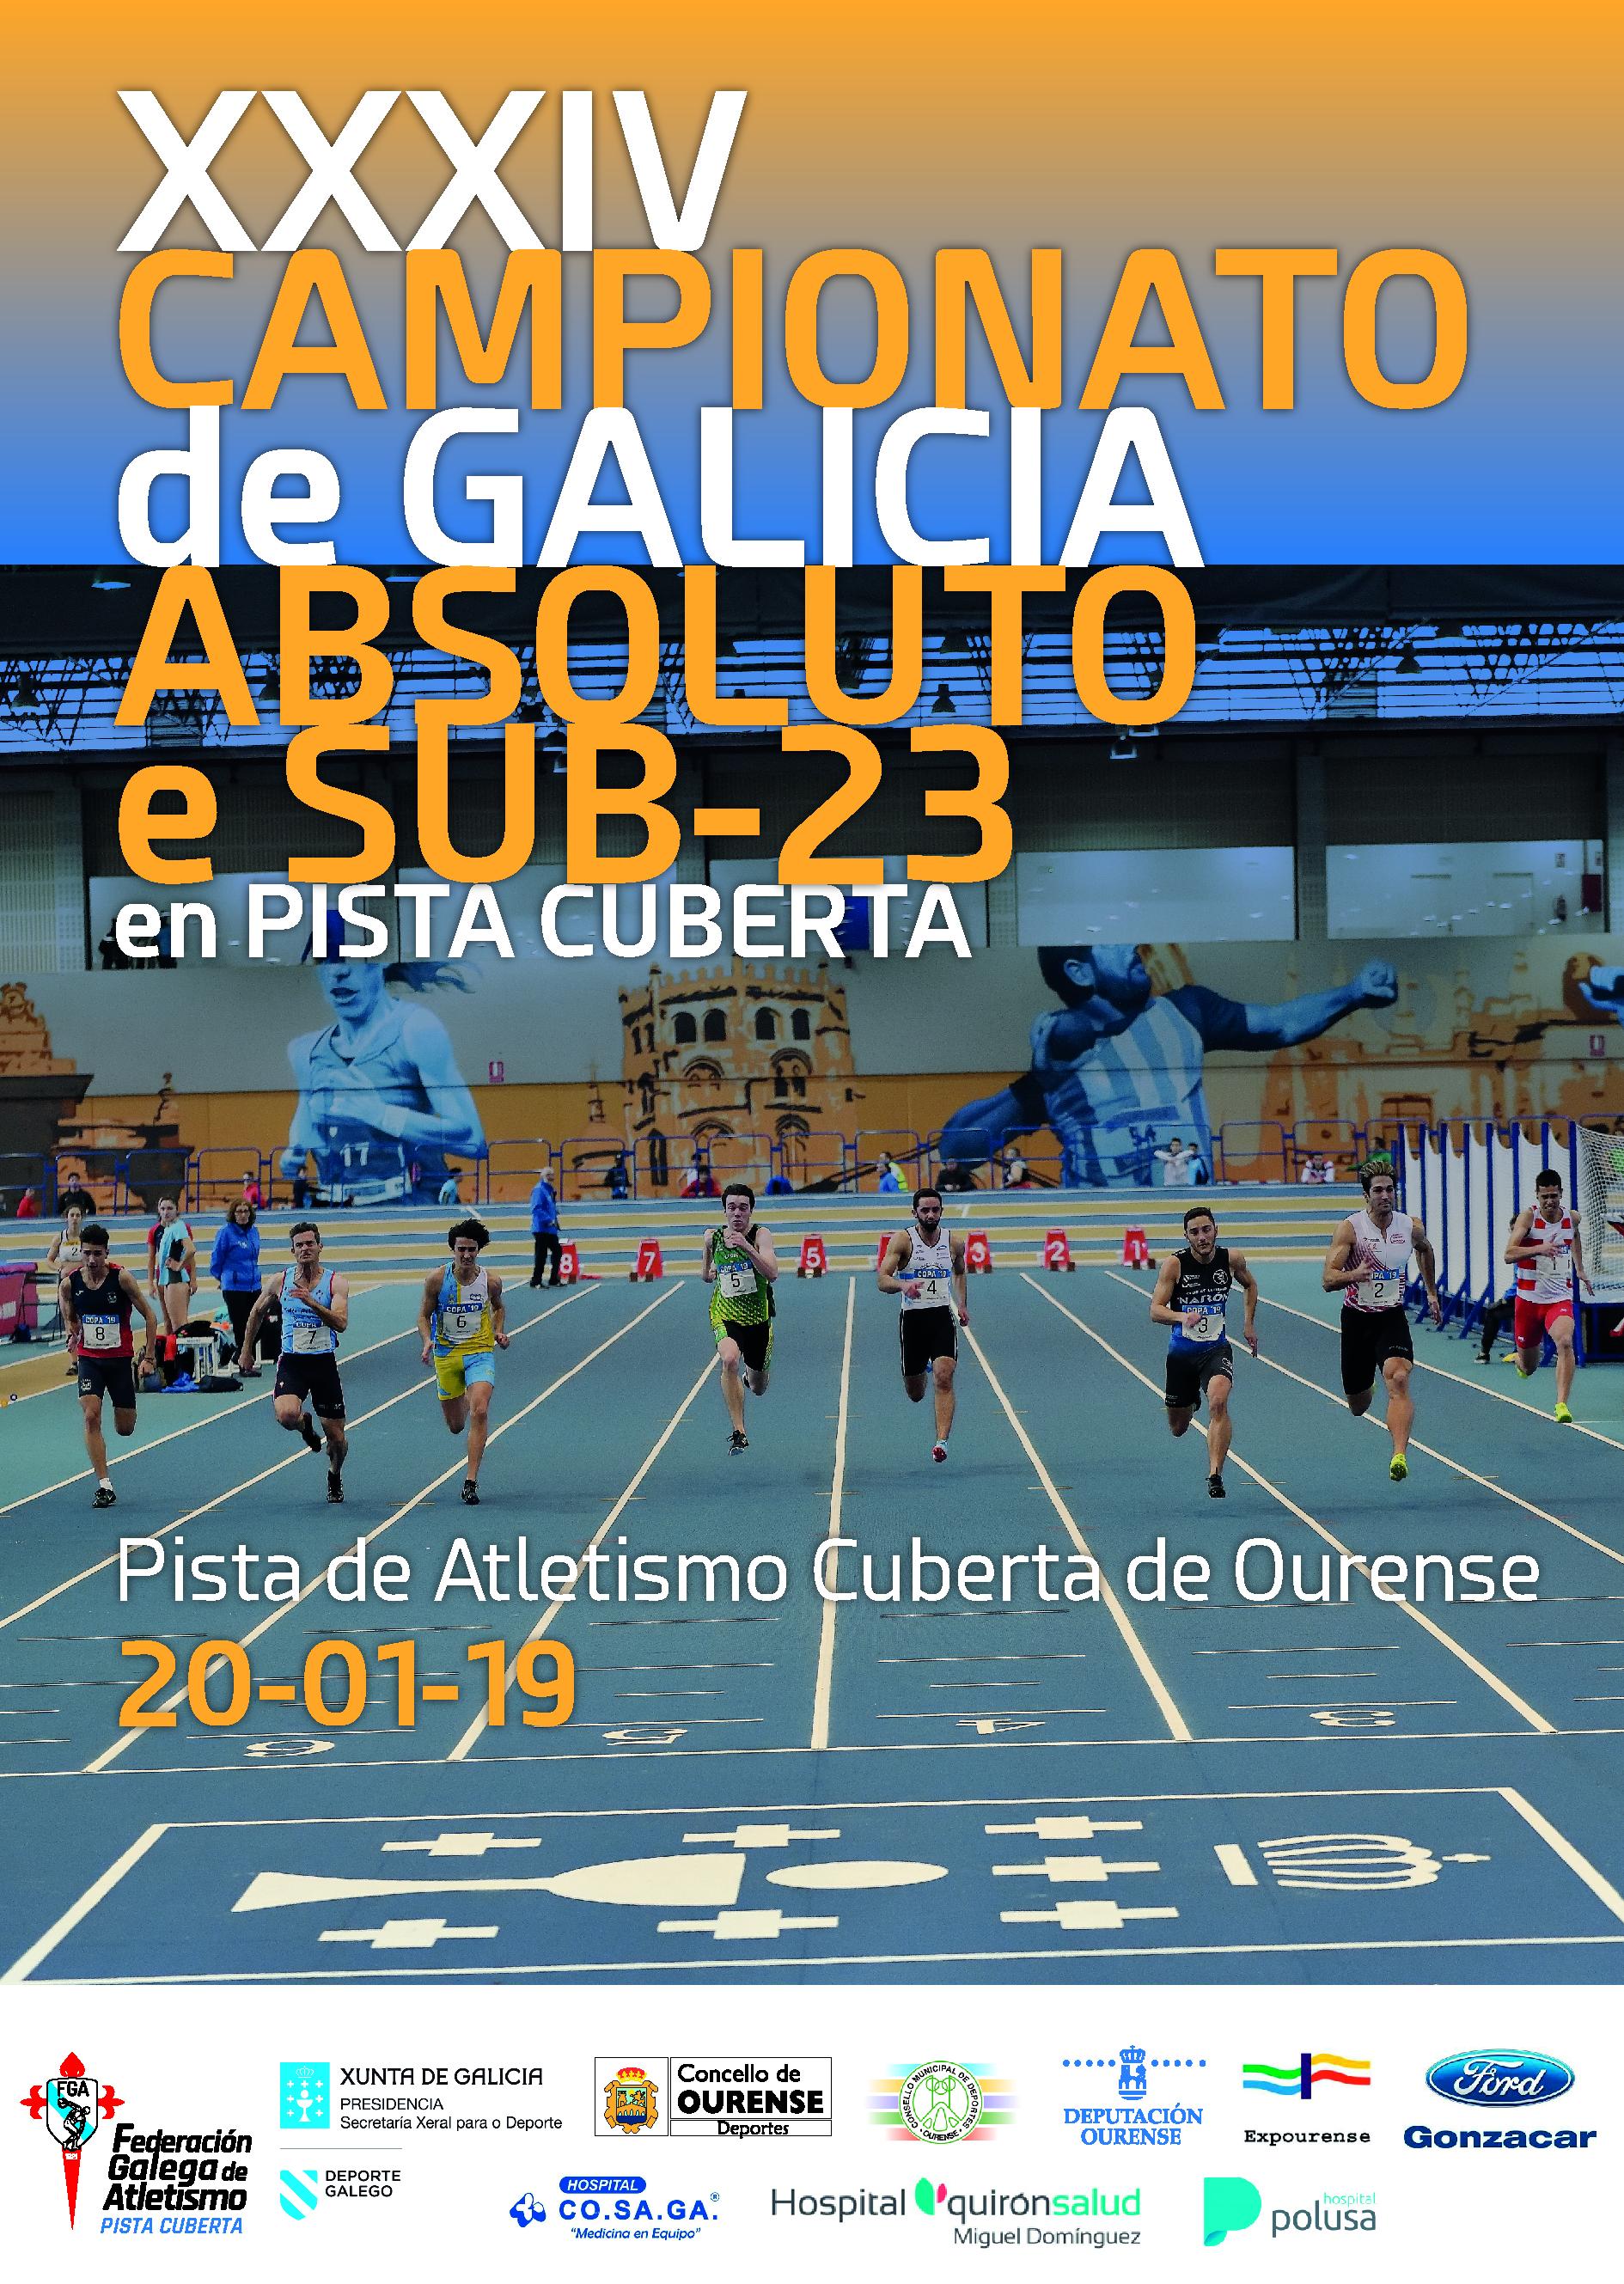 XXXIV Campionato de Galicia Absoluto – Sub23 en Pista Cuberta